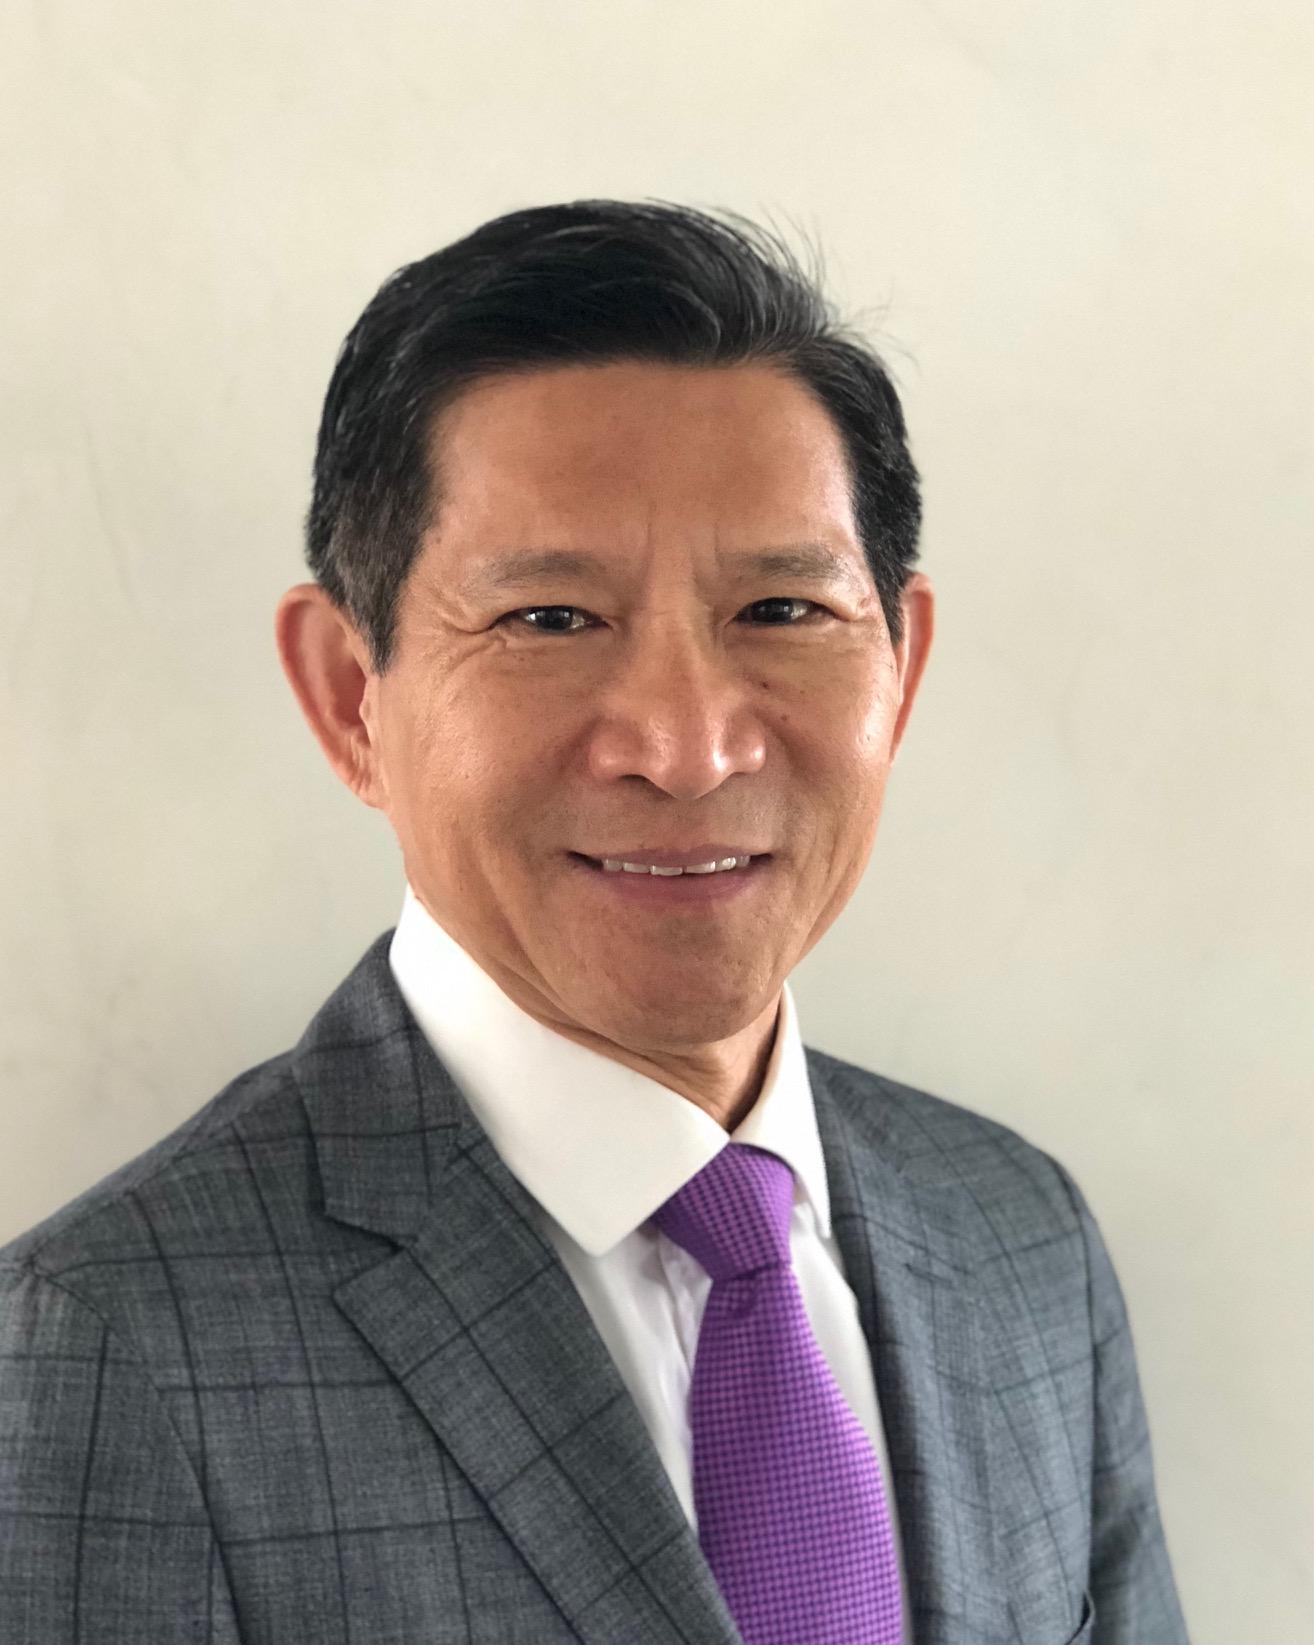 Marlon Young - CHAIRMAN/TRUSTEE EMERITUS(Senior Advisor and Associate Partner, Cambridge Family Enterprise Group